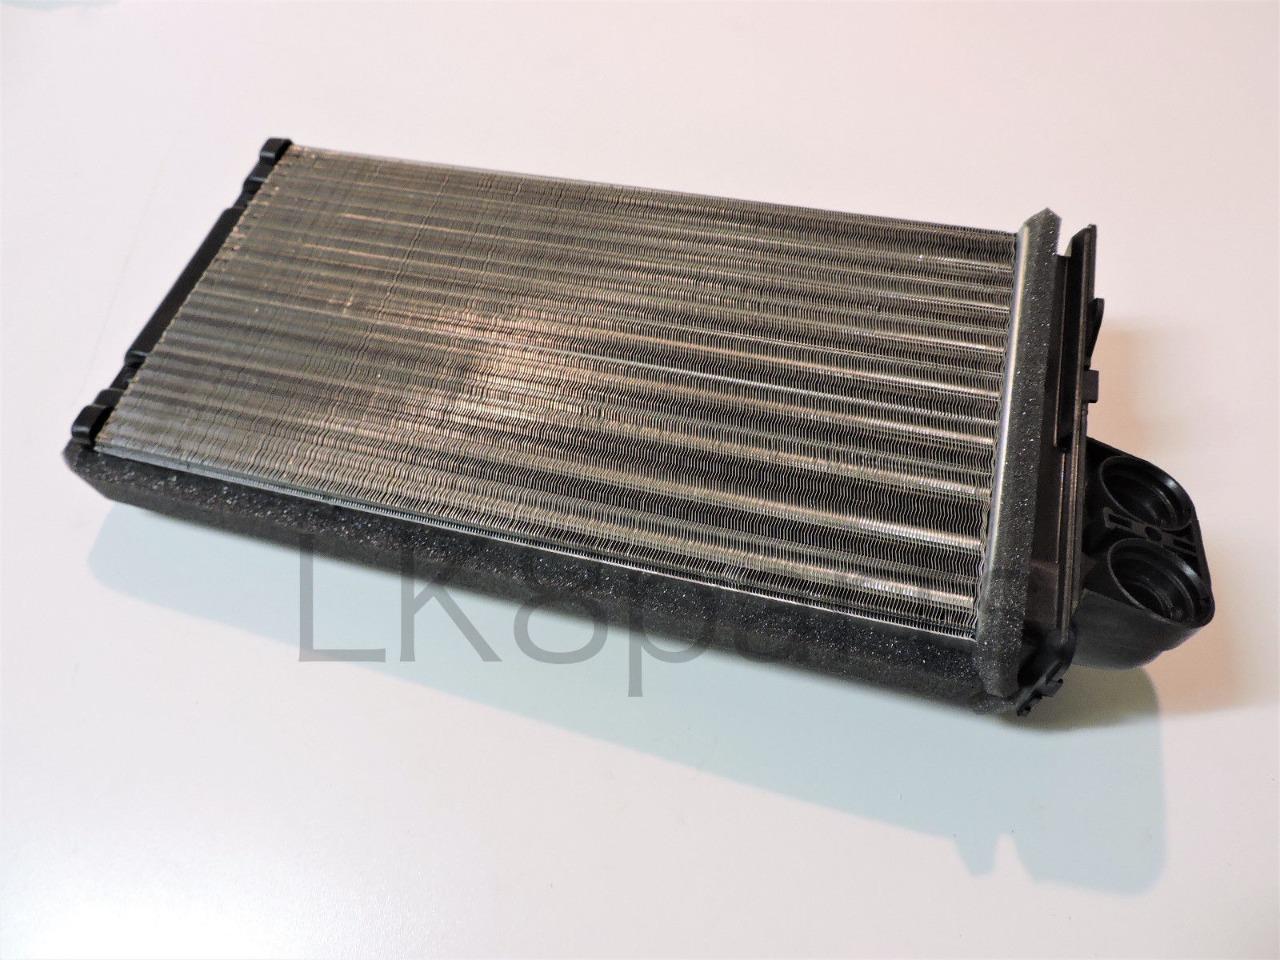 Land Rover Range 95-02 P38 Heater Matrix Core w//Orings KIT STC3261 STC3262 New